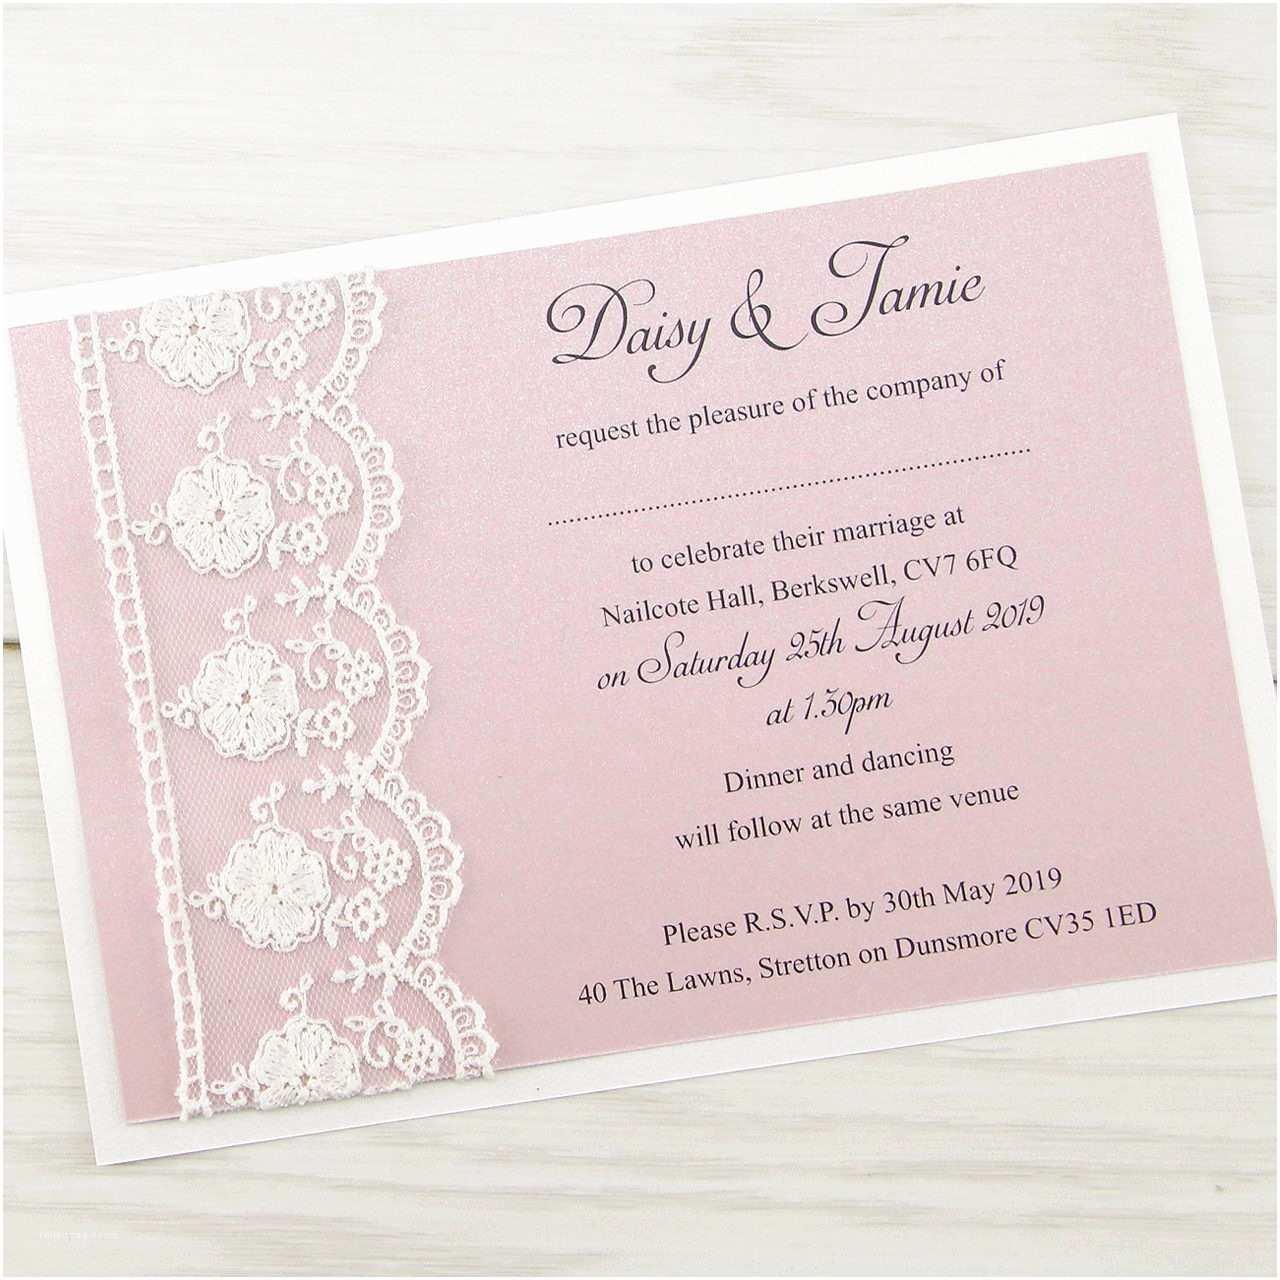 Cheap Wedding Invitation Ideas Invitations Inexpensive Wedding Invitations for Fancy